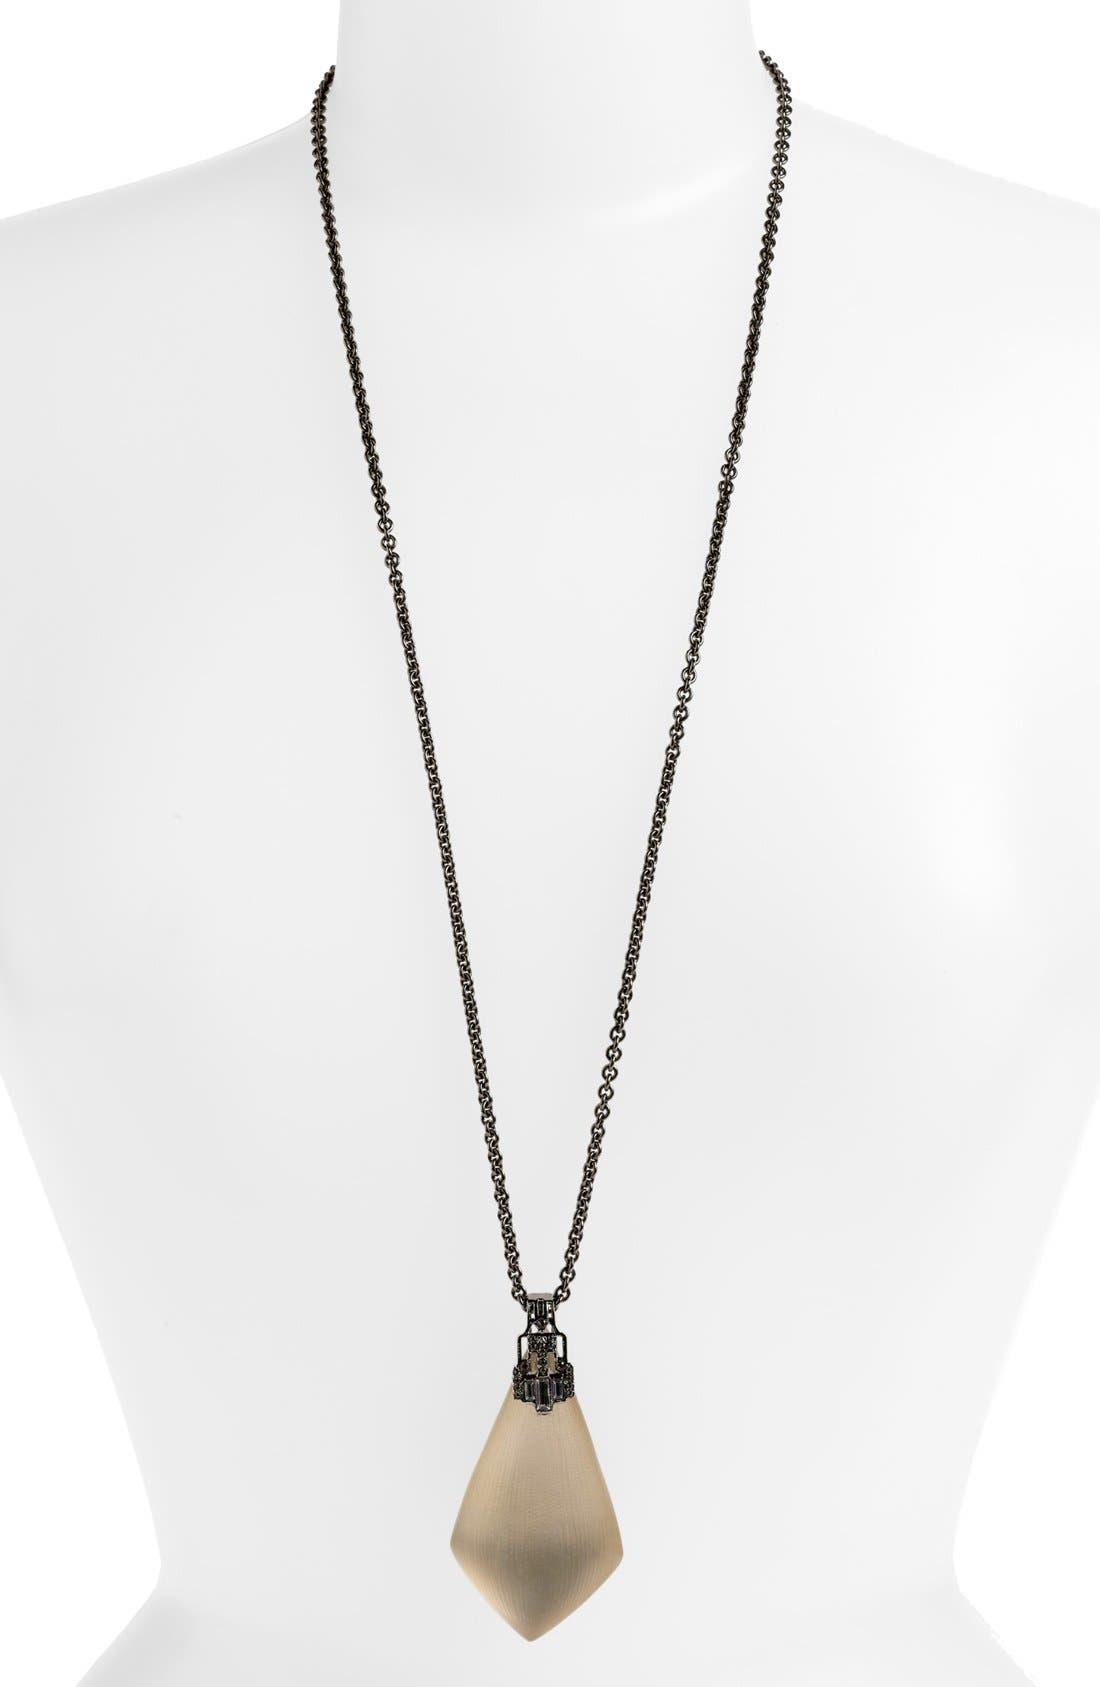 Main Image - Alexis Bittar 'Lucite® - Deco' Long Pendant Necklace (Nordstrom Exclusive)